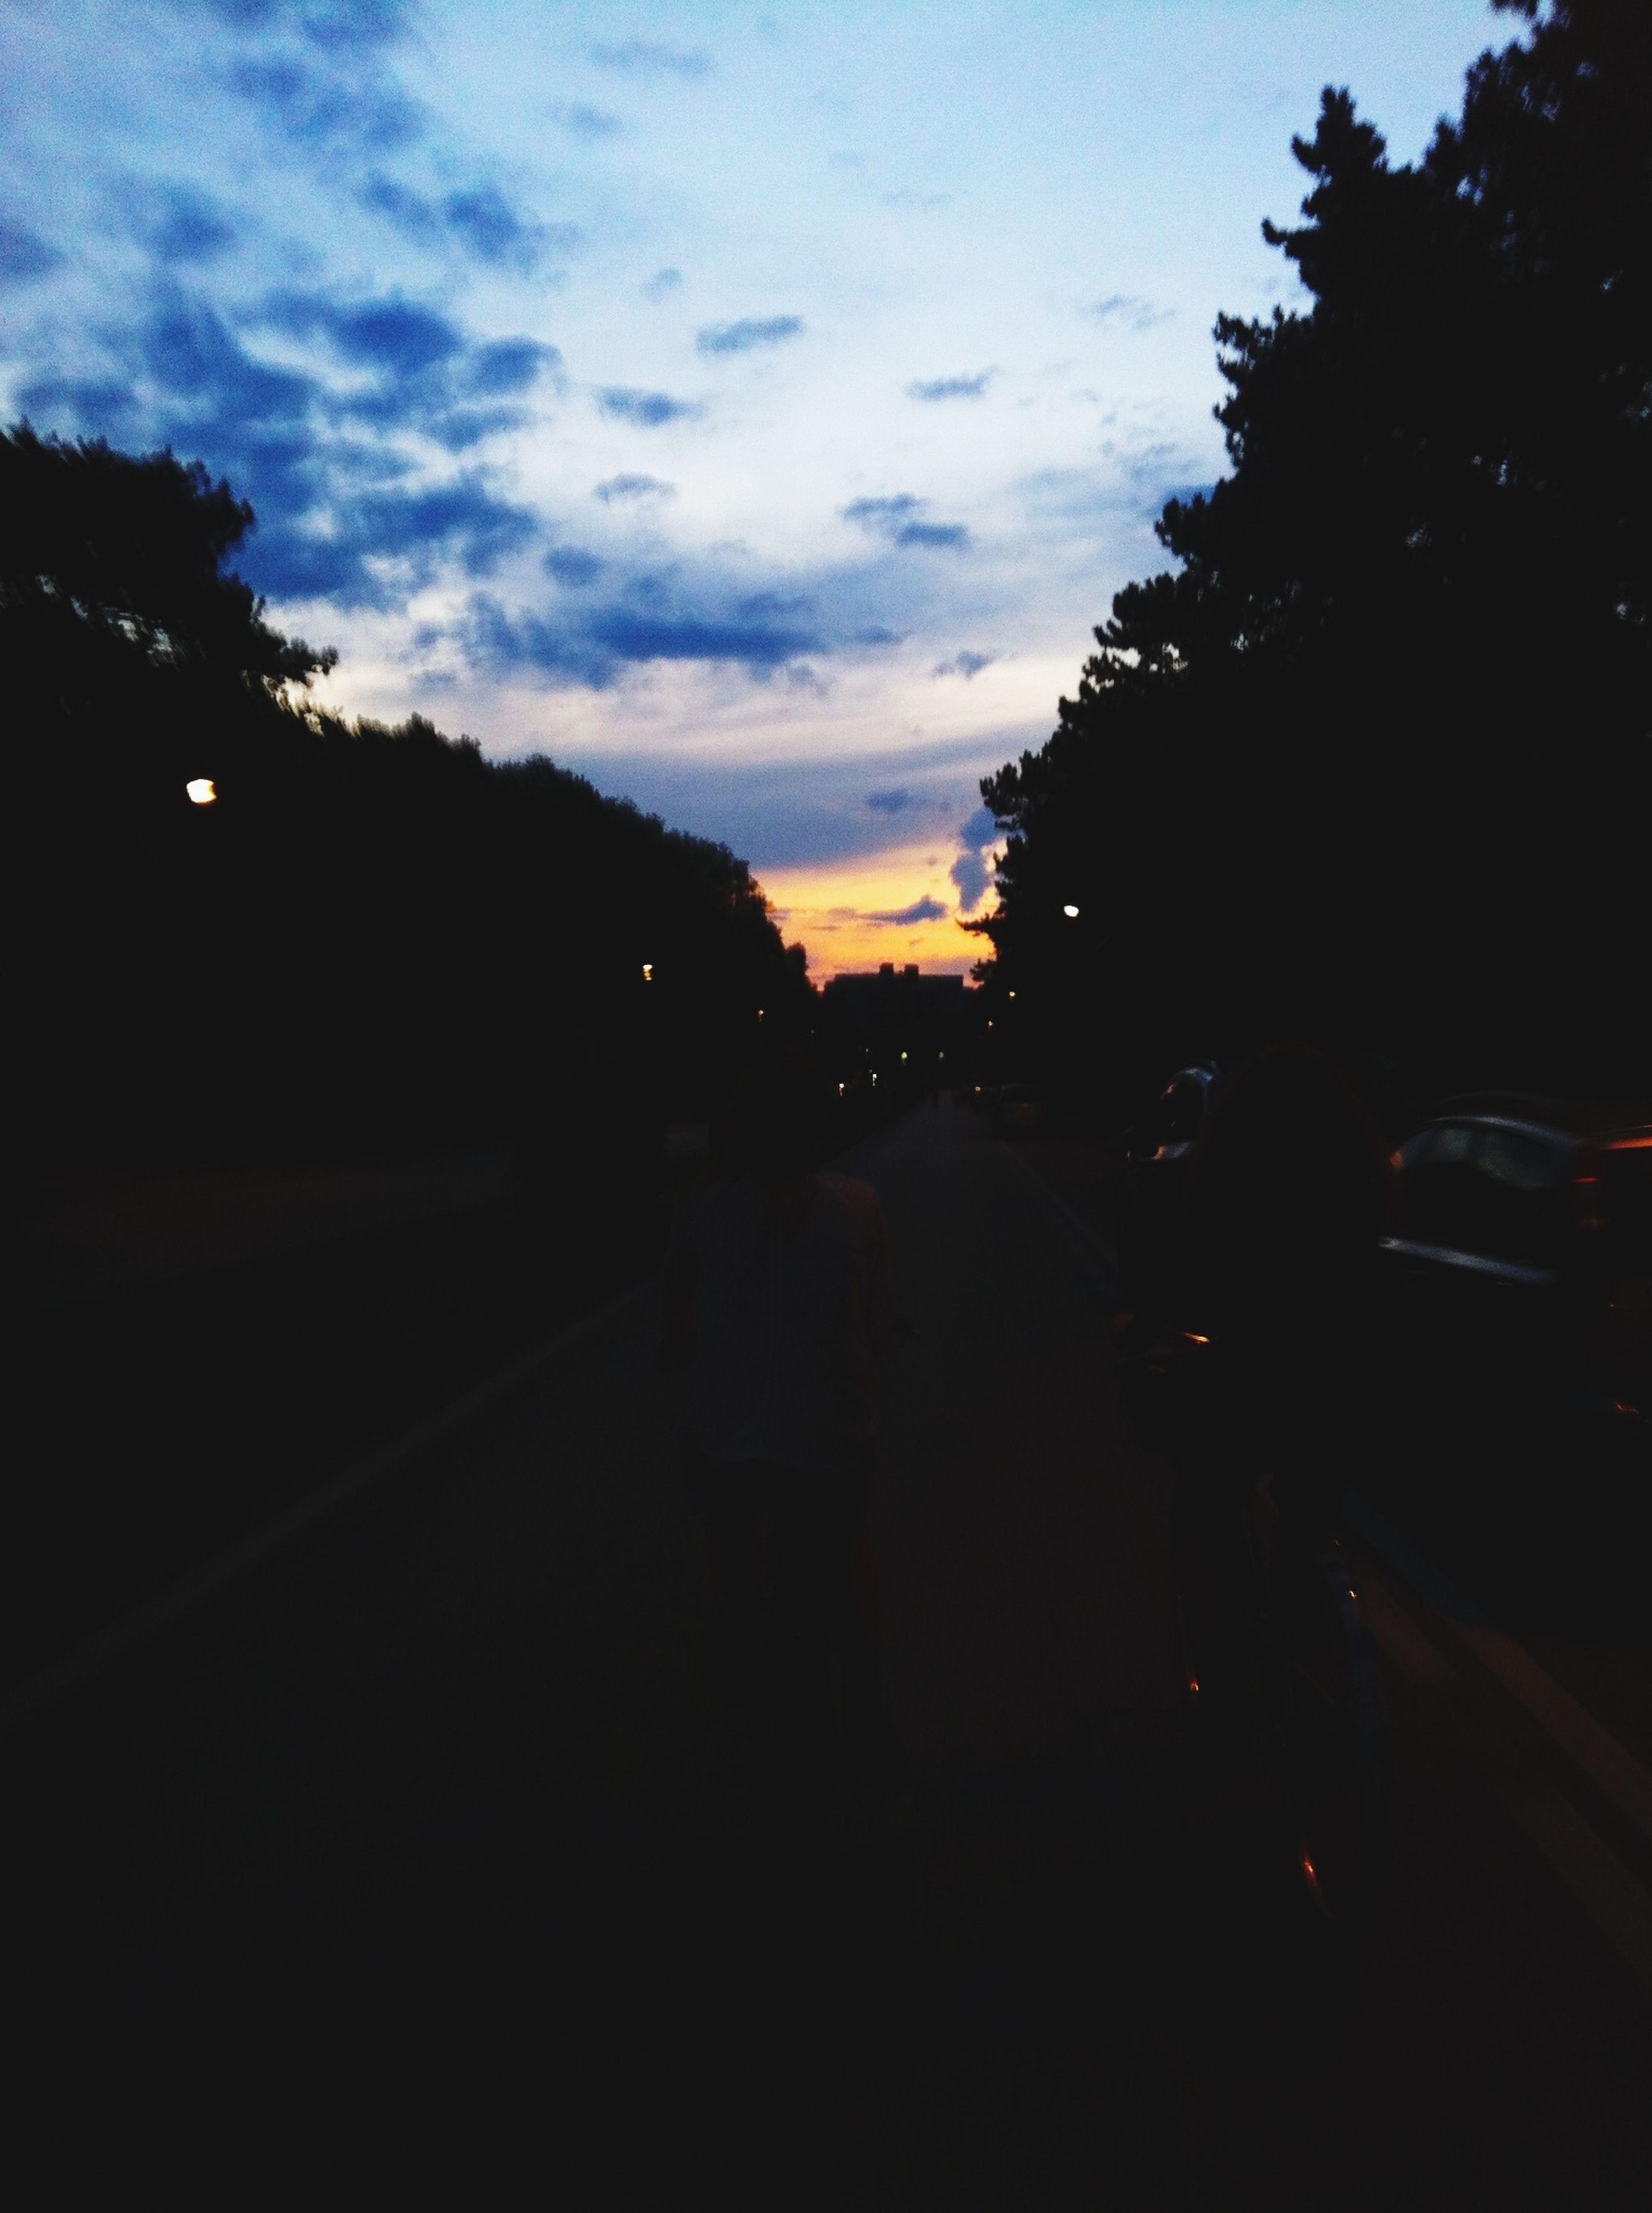 transportation, sunset, car, sky, silhouette, land vehicle, tree, street, mode of transport, road, cloud - sky, dusk, cloud, dark, outdoors, building exterior, city, nature, no people, travel